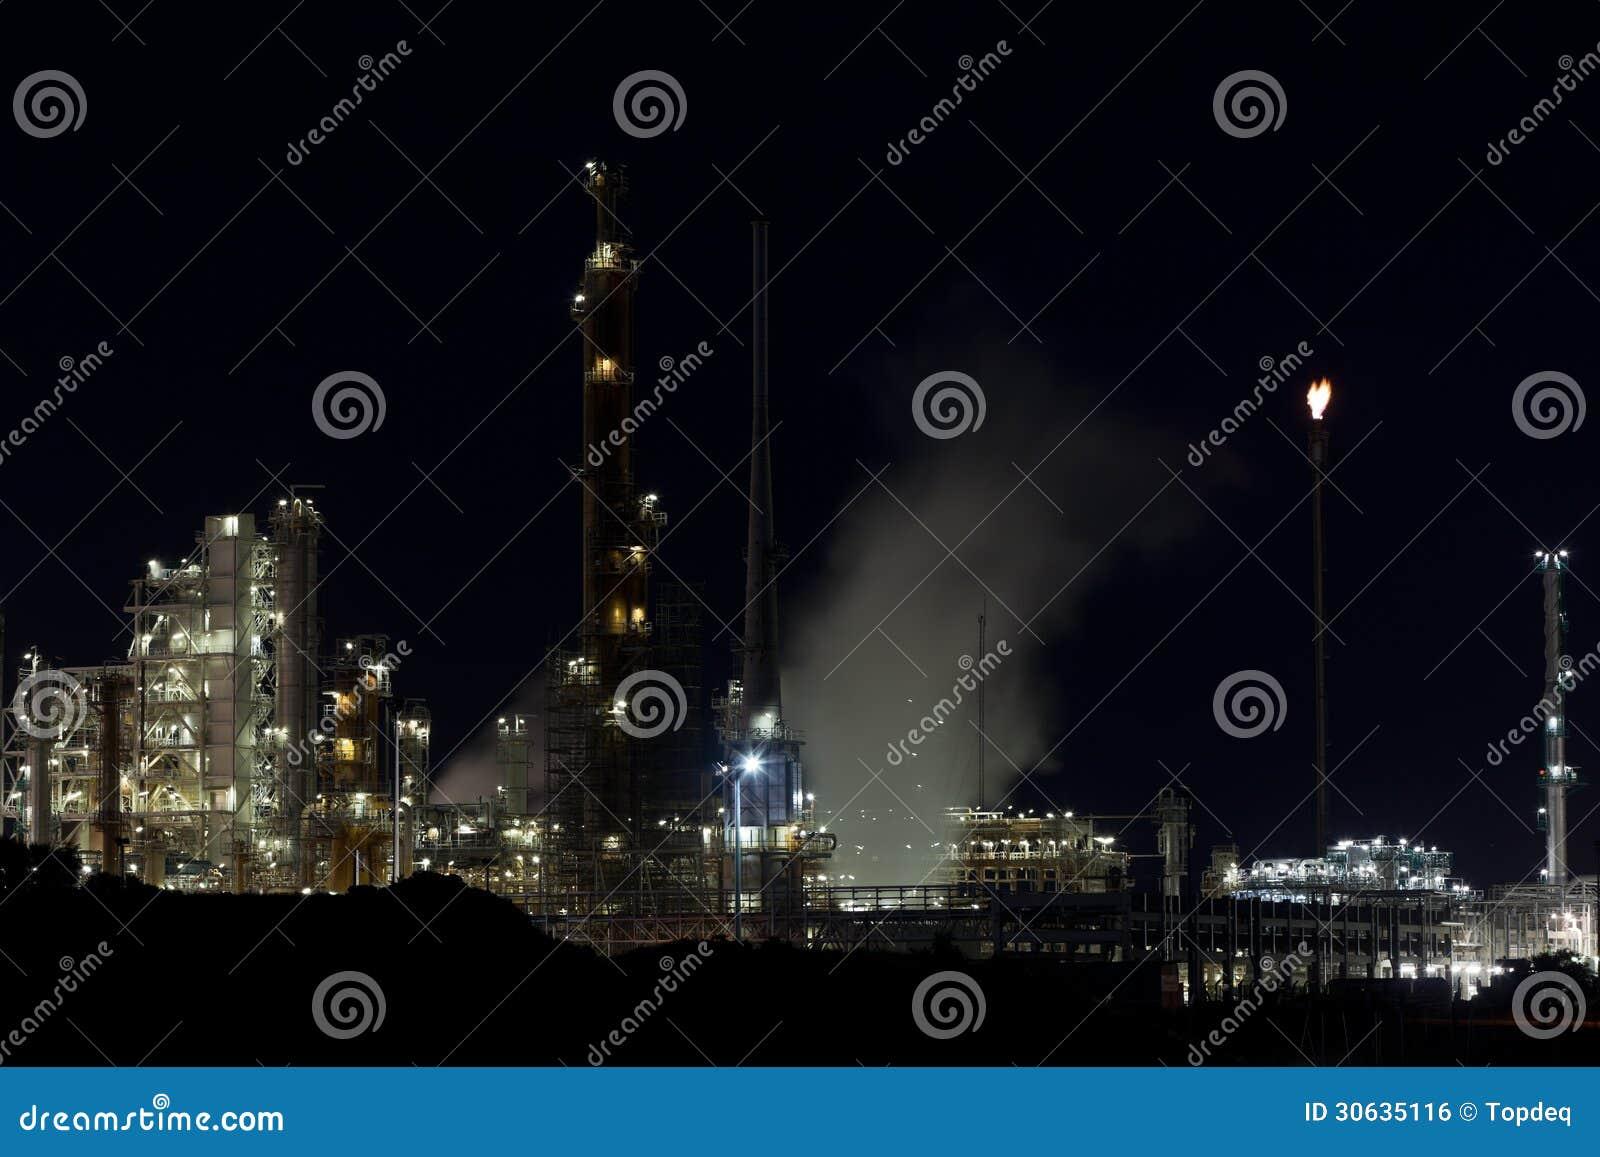 night-view-oil-refinery-plant-horizontal